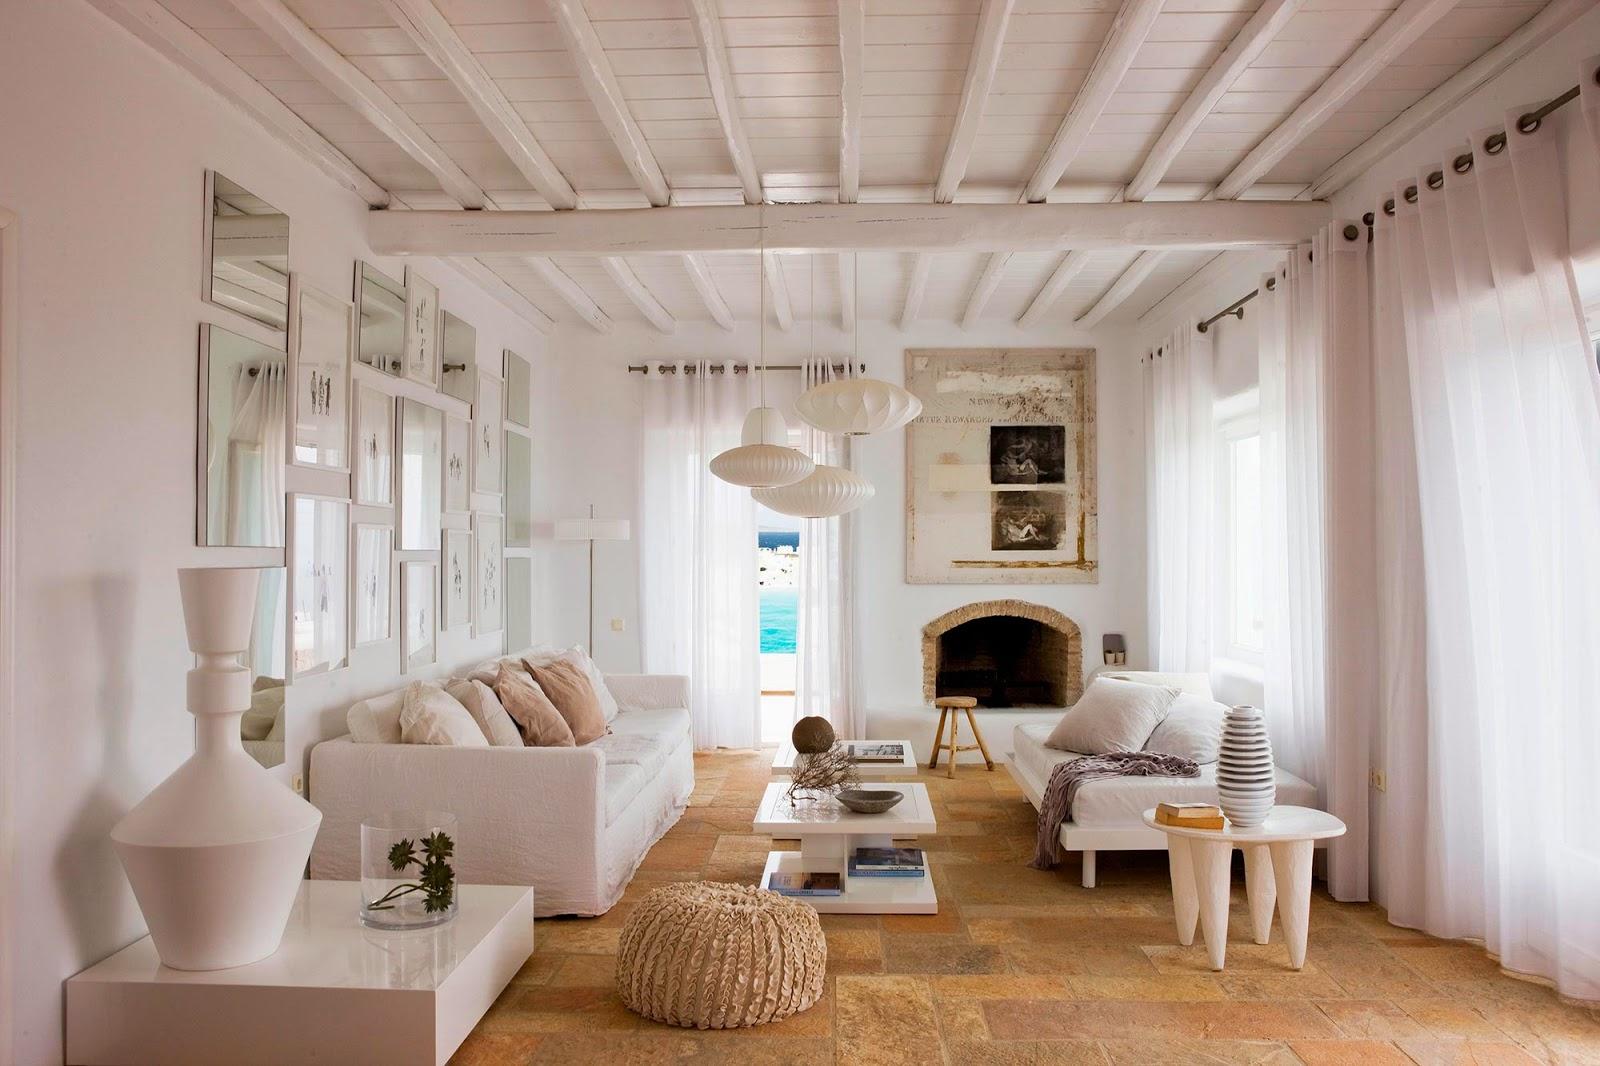 hogar 10 15 euros de regalo para tus compras de hogar en westwing. Black Bedroom Furniture Sets. Home Design Ideas